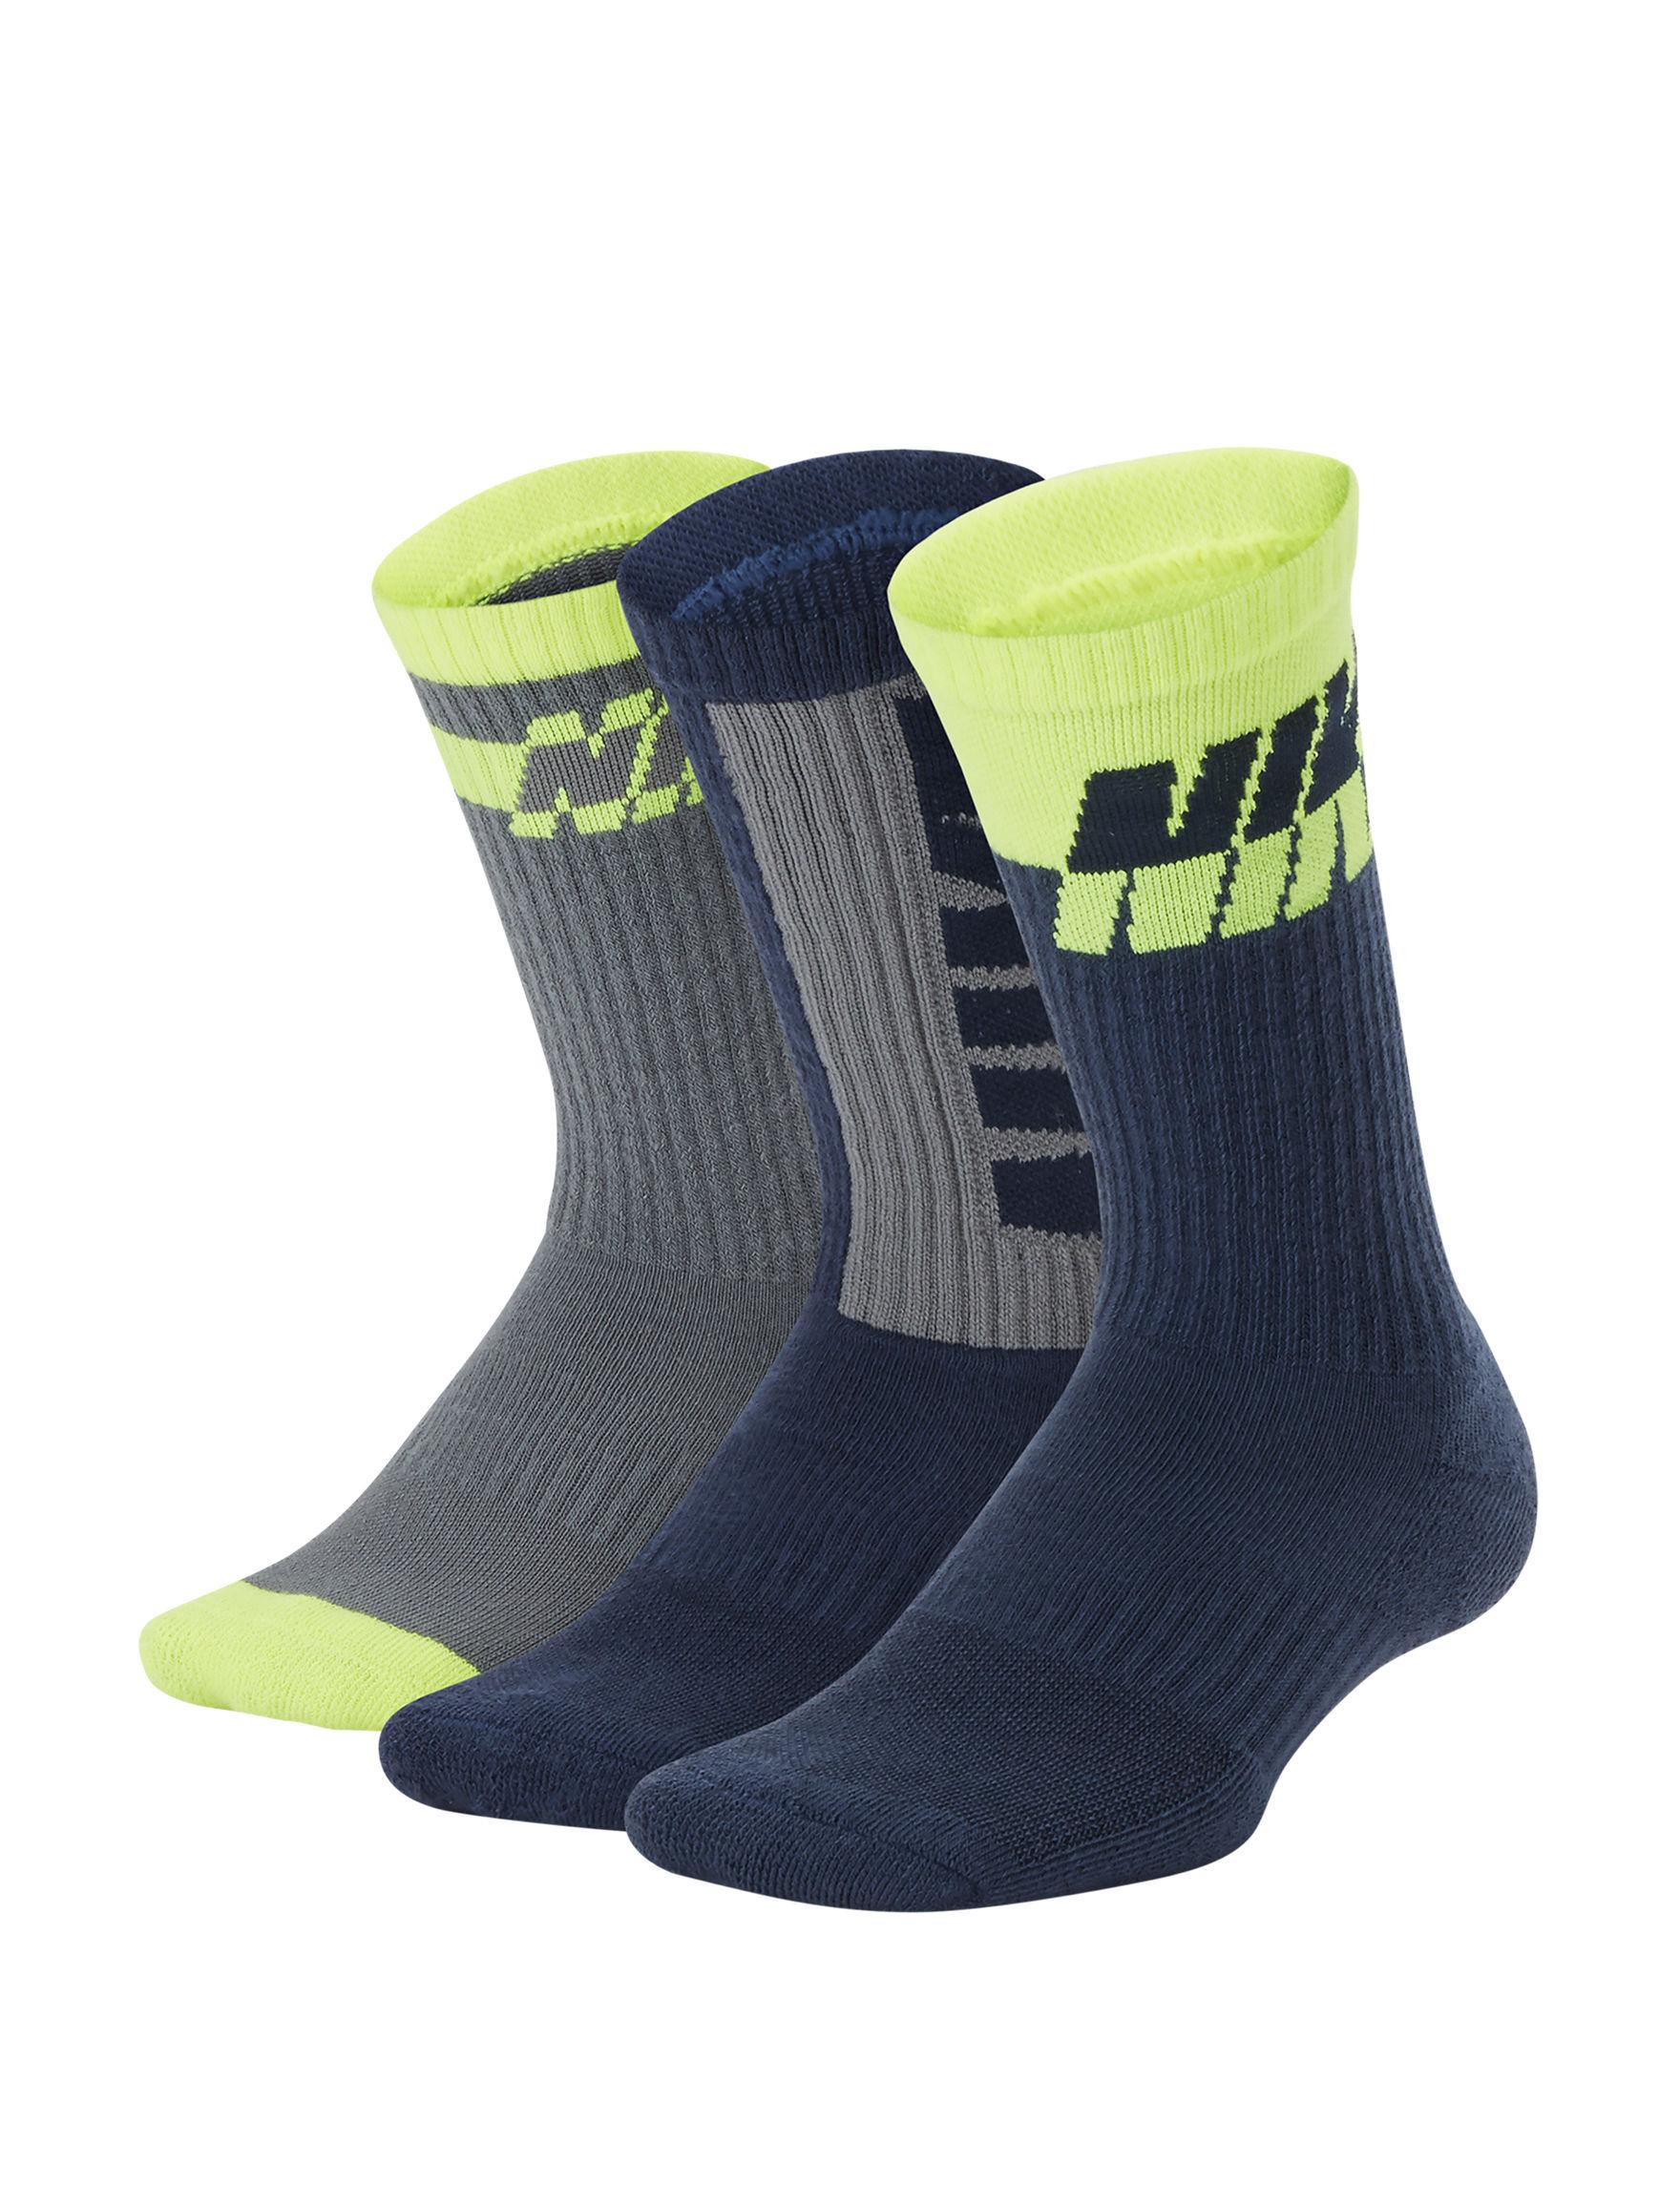 Nike Black / Grey / Volt Socks